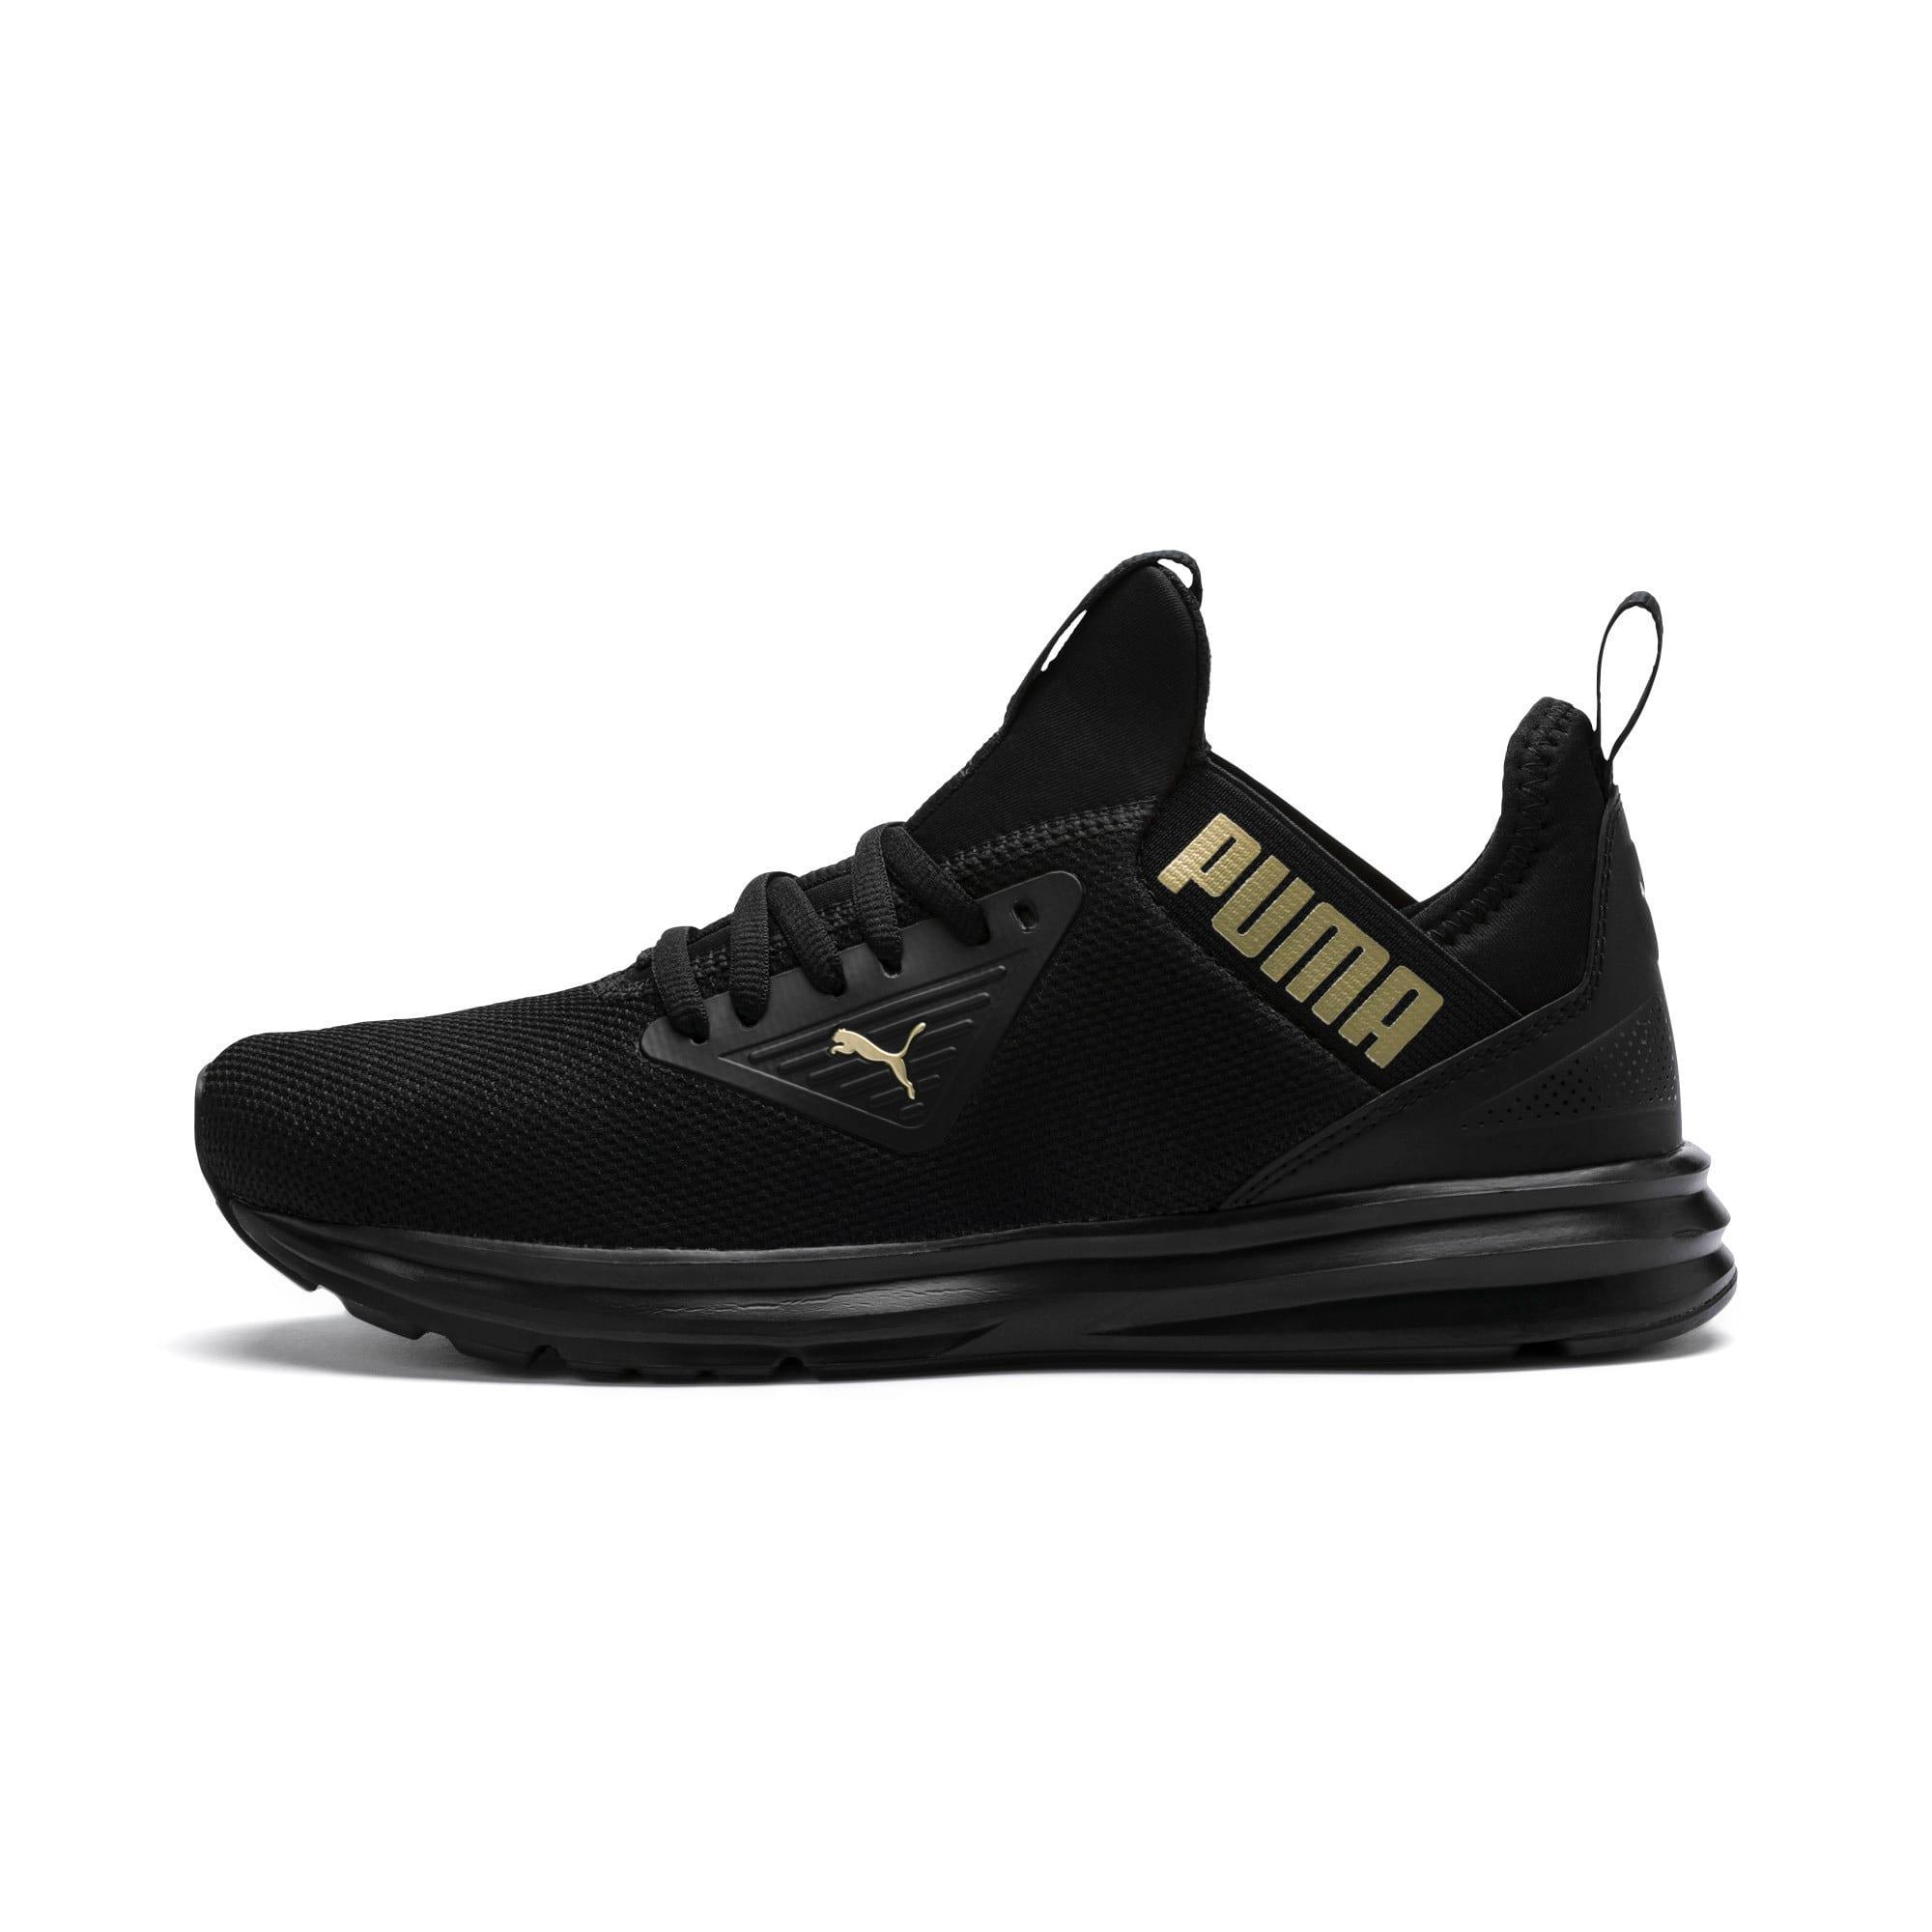 Thumbnail 1 of Enzo Beta Women's Training Shoes, Puma Black-Metallic Gold, medium